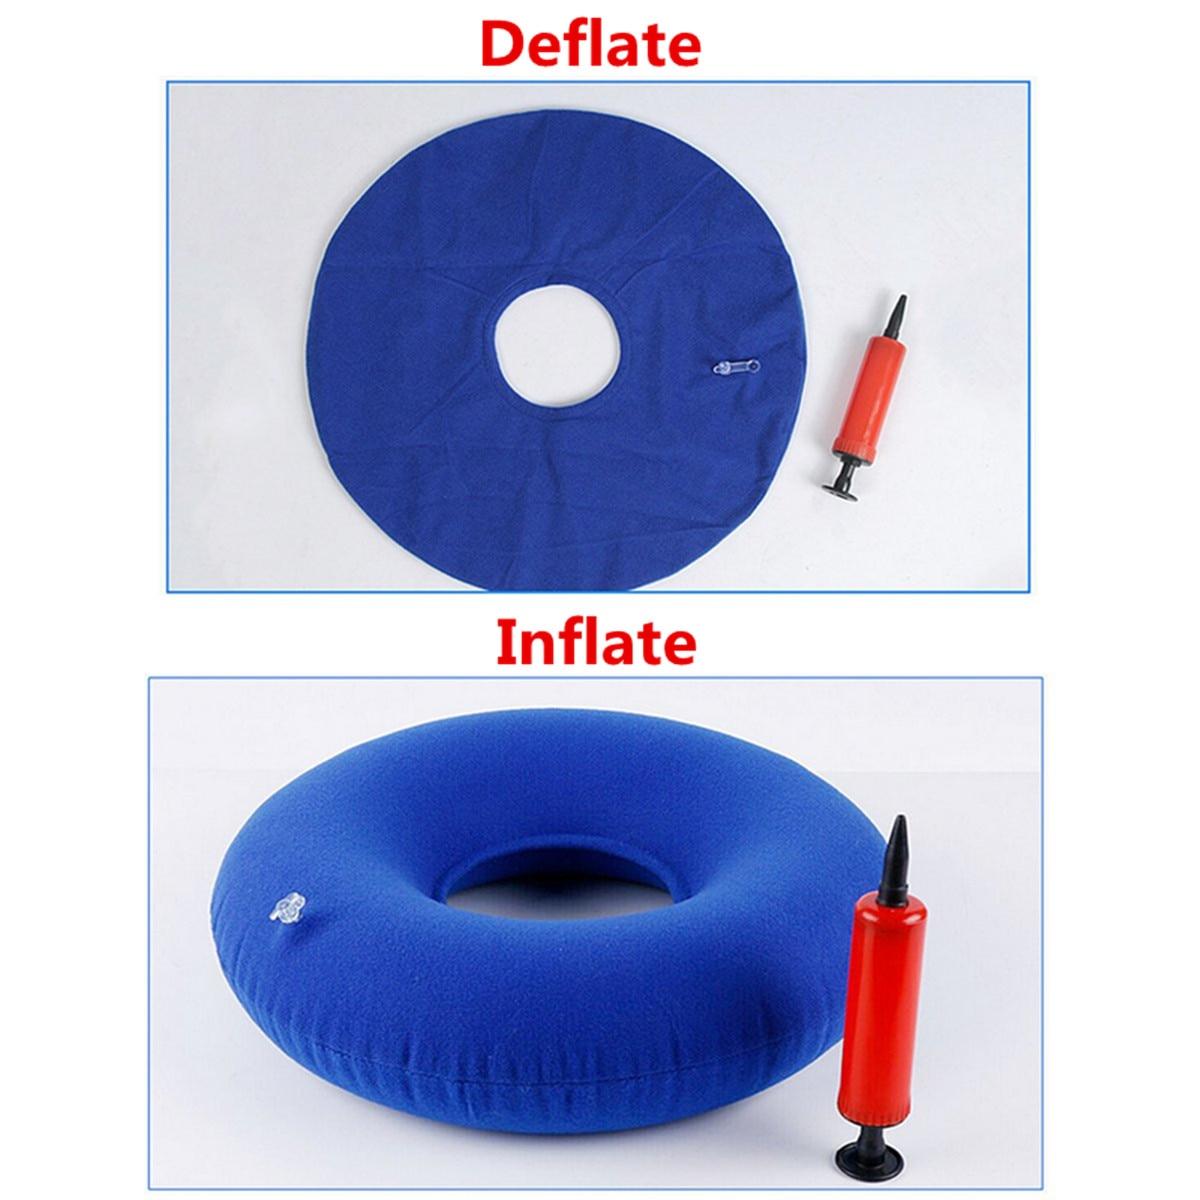 35cm Inflatable Ring Round Medical PVC Seat Donut Cushion Air Pillow Anti Hemorrhoid